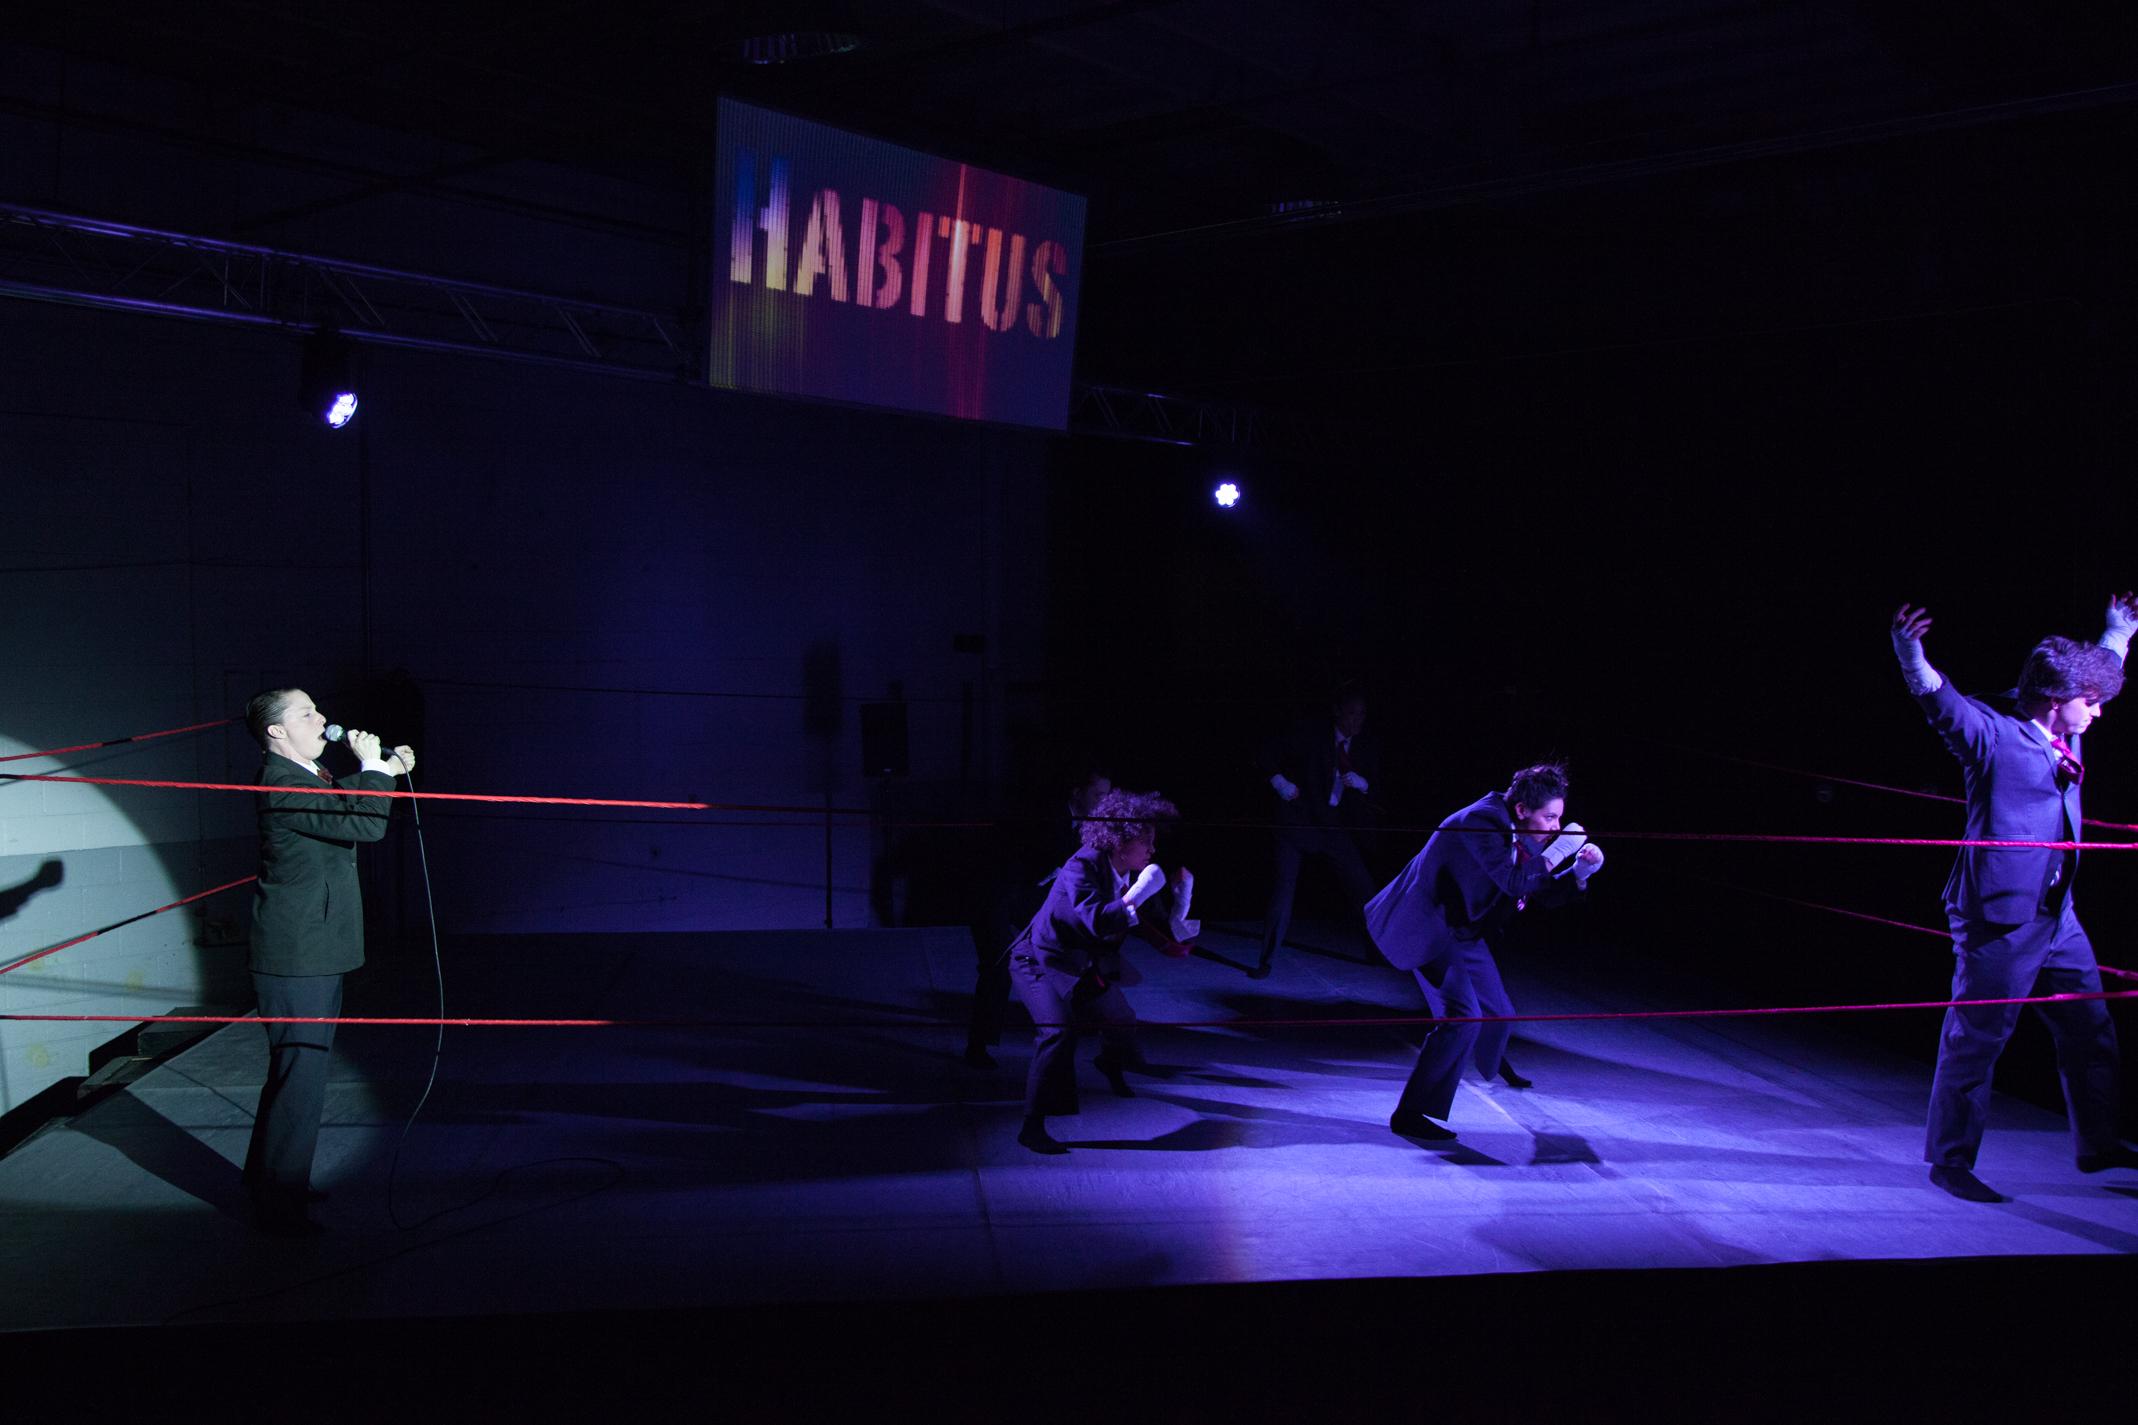 Habitus - Co-Director / Scenic Design / Lighting Design / Projection Design